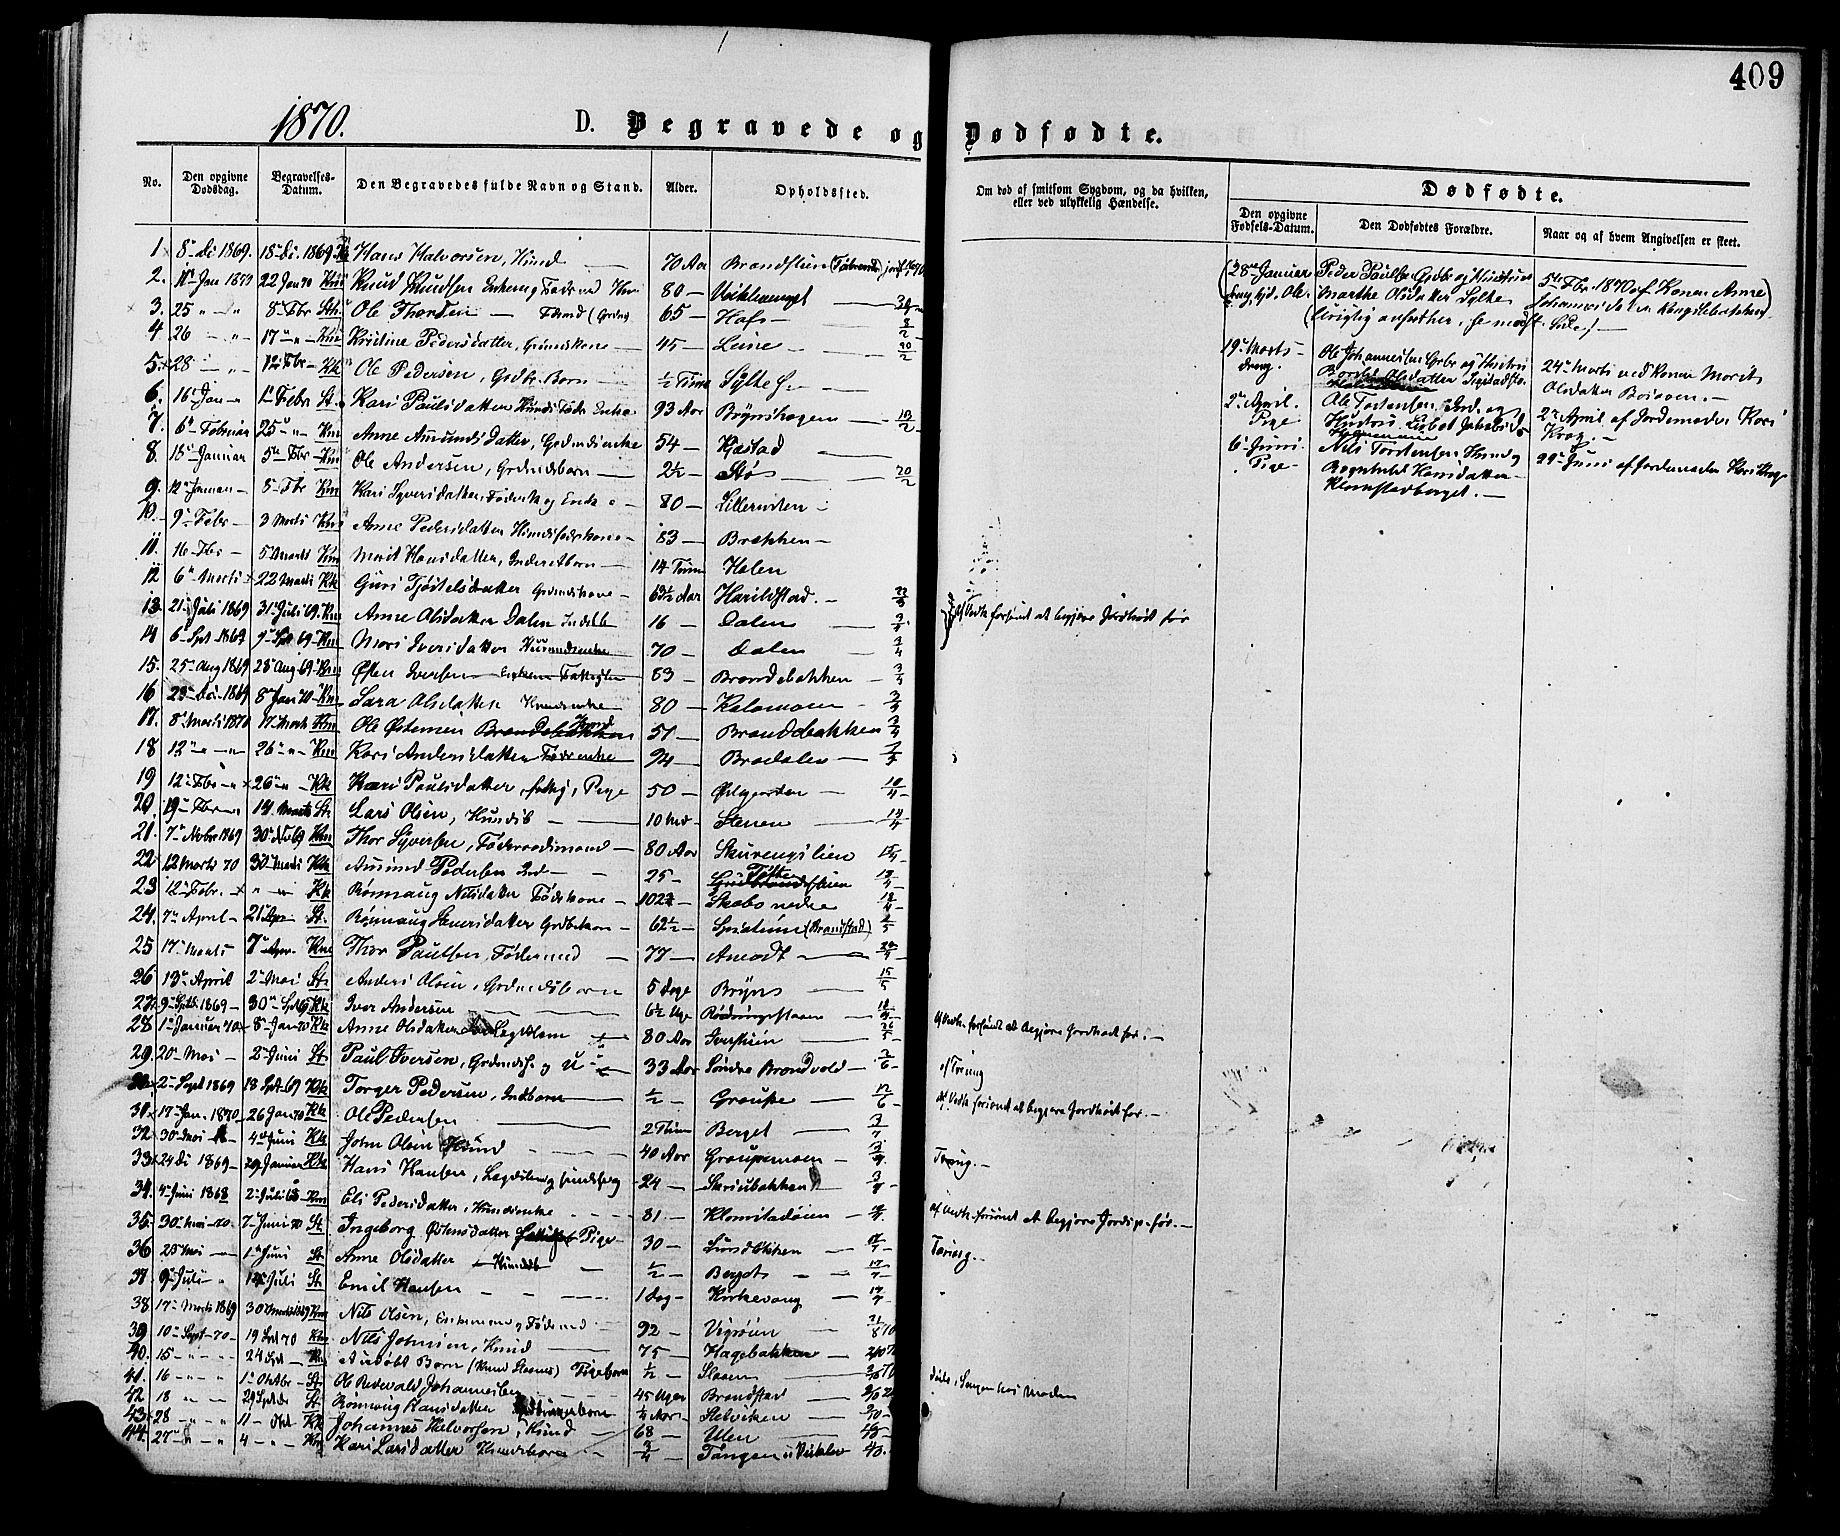 SAH, Nord-Fron prestekontor, Ministerialbok nr. 2, 1865-1883, s. 409